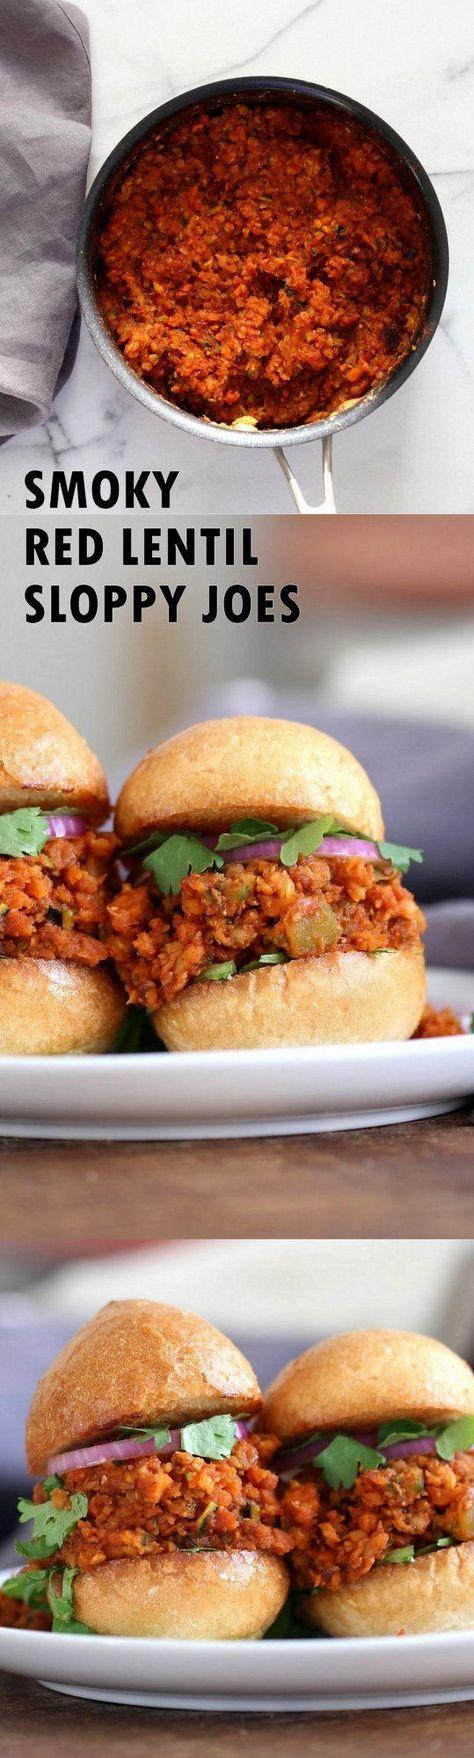 Smoky Vegan Sloppy Joes with Cajun Spices. Easy Red Lentil Carrot Zucchini Sloppy mix. Serve between soft buns, dinner rolls, pita pockets or tacos. Vegan Nut-free Recipe. Soy free option. Easily Gluten-free. | VeganRicha.com